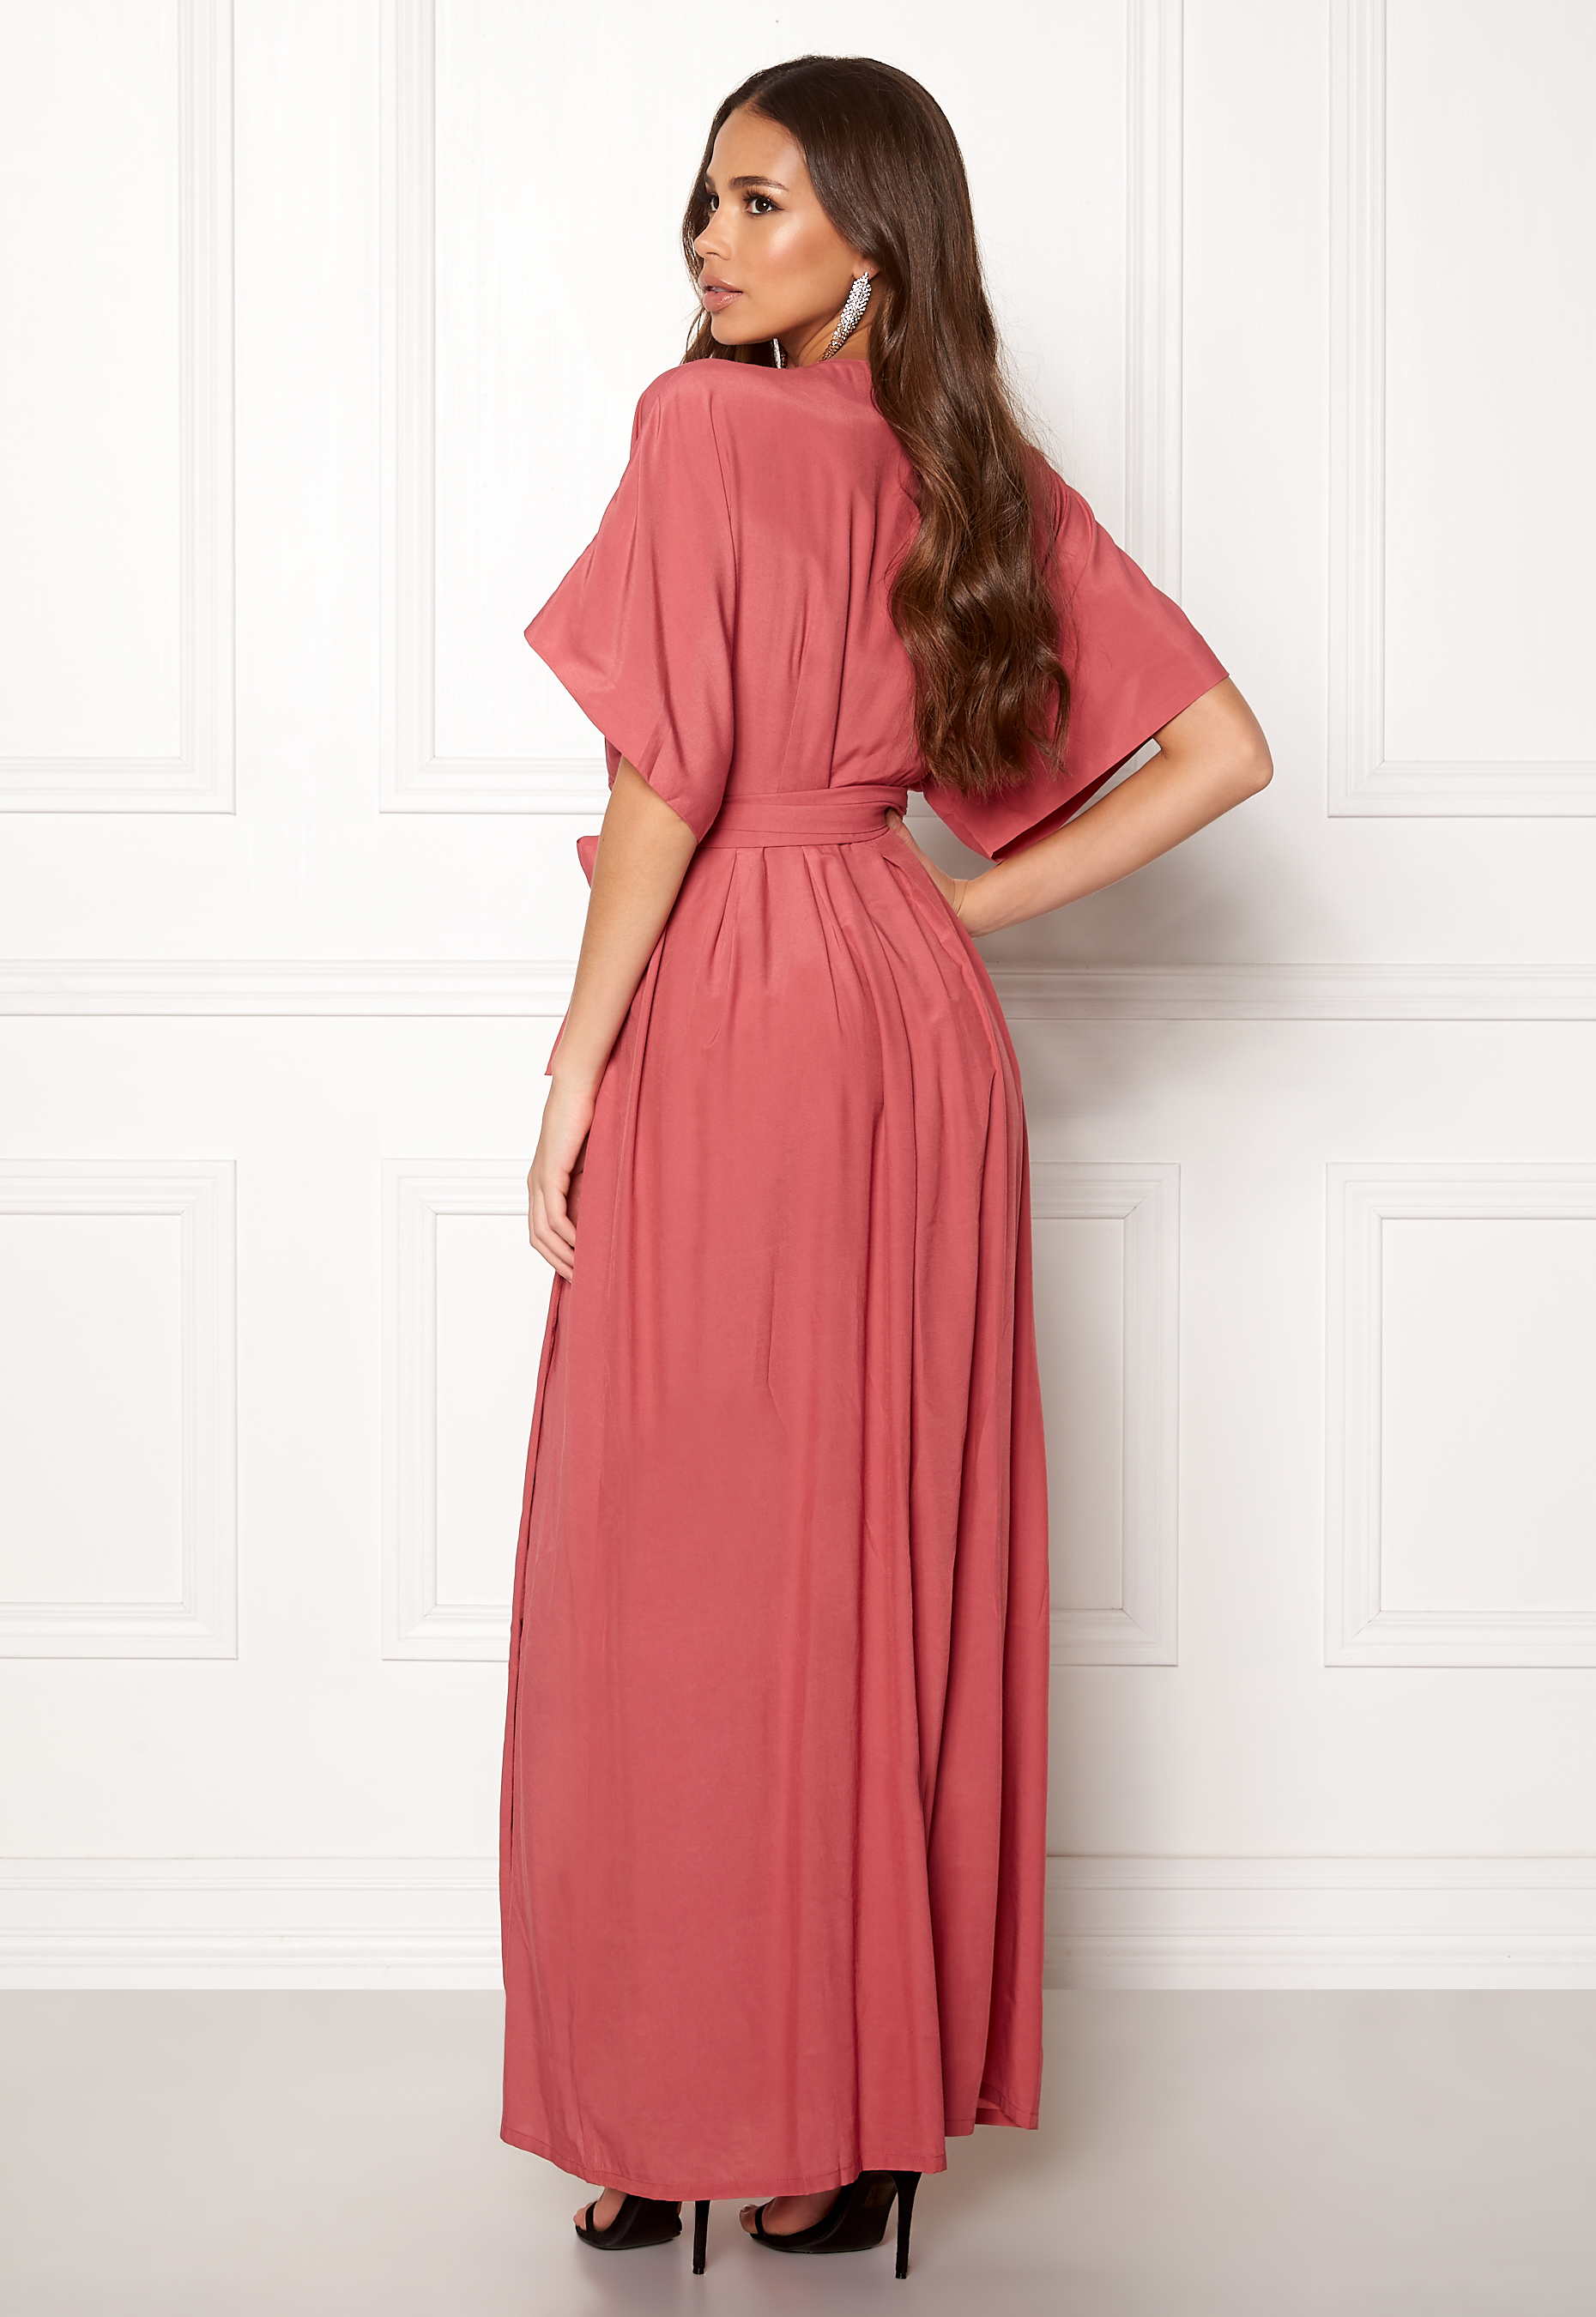 b5c4567a DRY LAKE Florence Dress Dull Pink - Bubbleroom